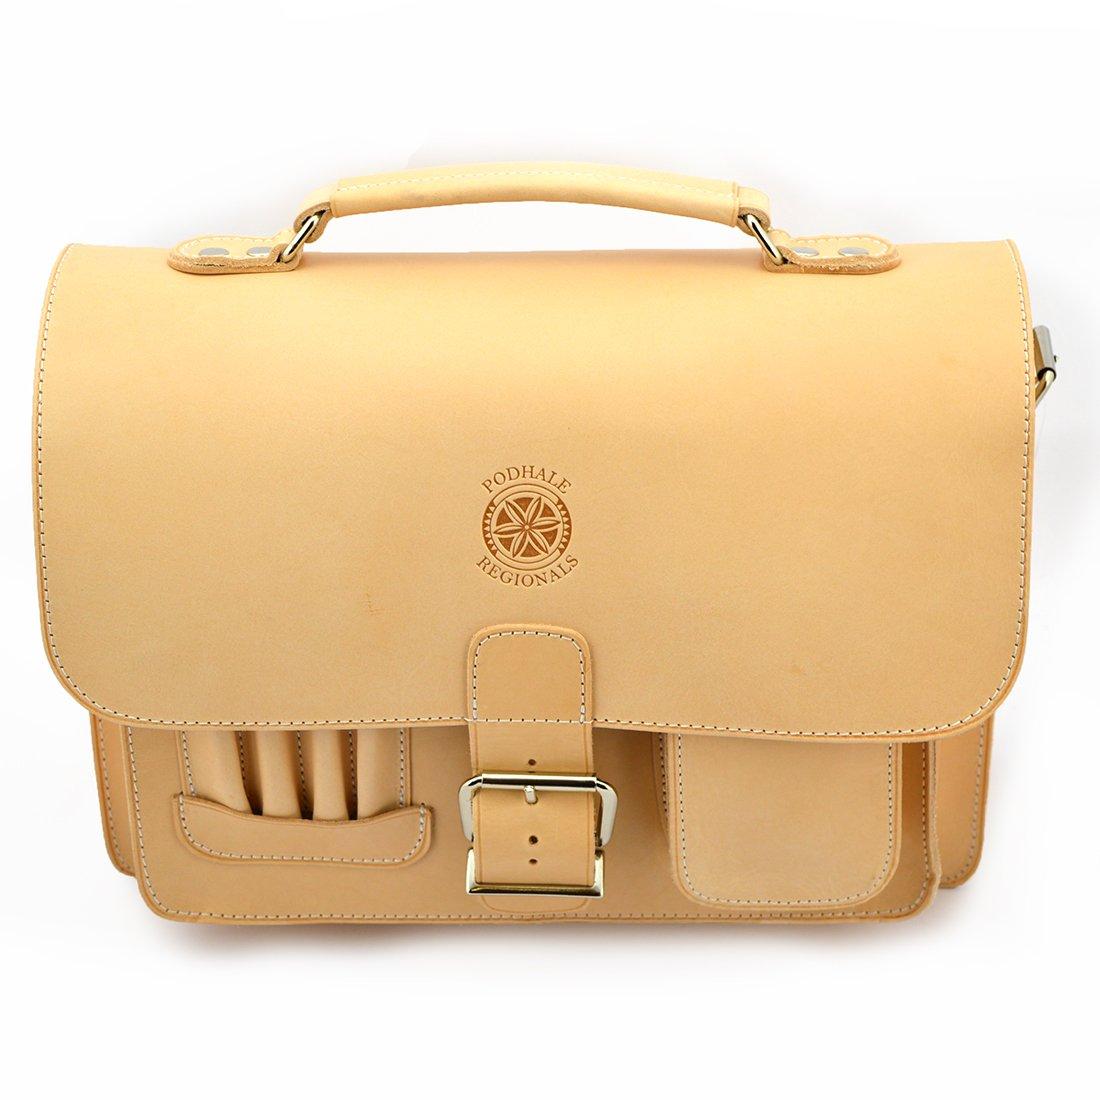 4fc5ae2107144 Klasyczna torba Podhale Regionals b919 natural - Skóra juchtowa premium    natural - Kup teraz Online